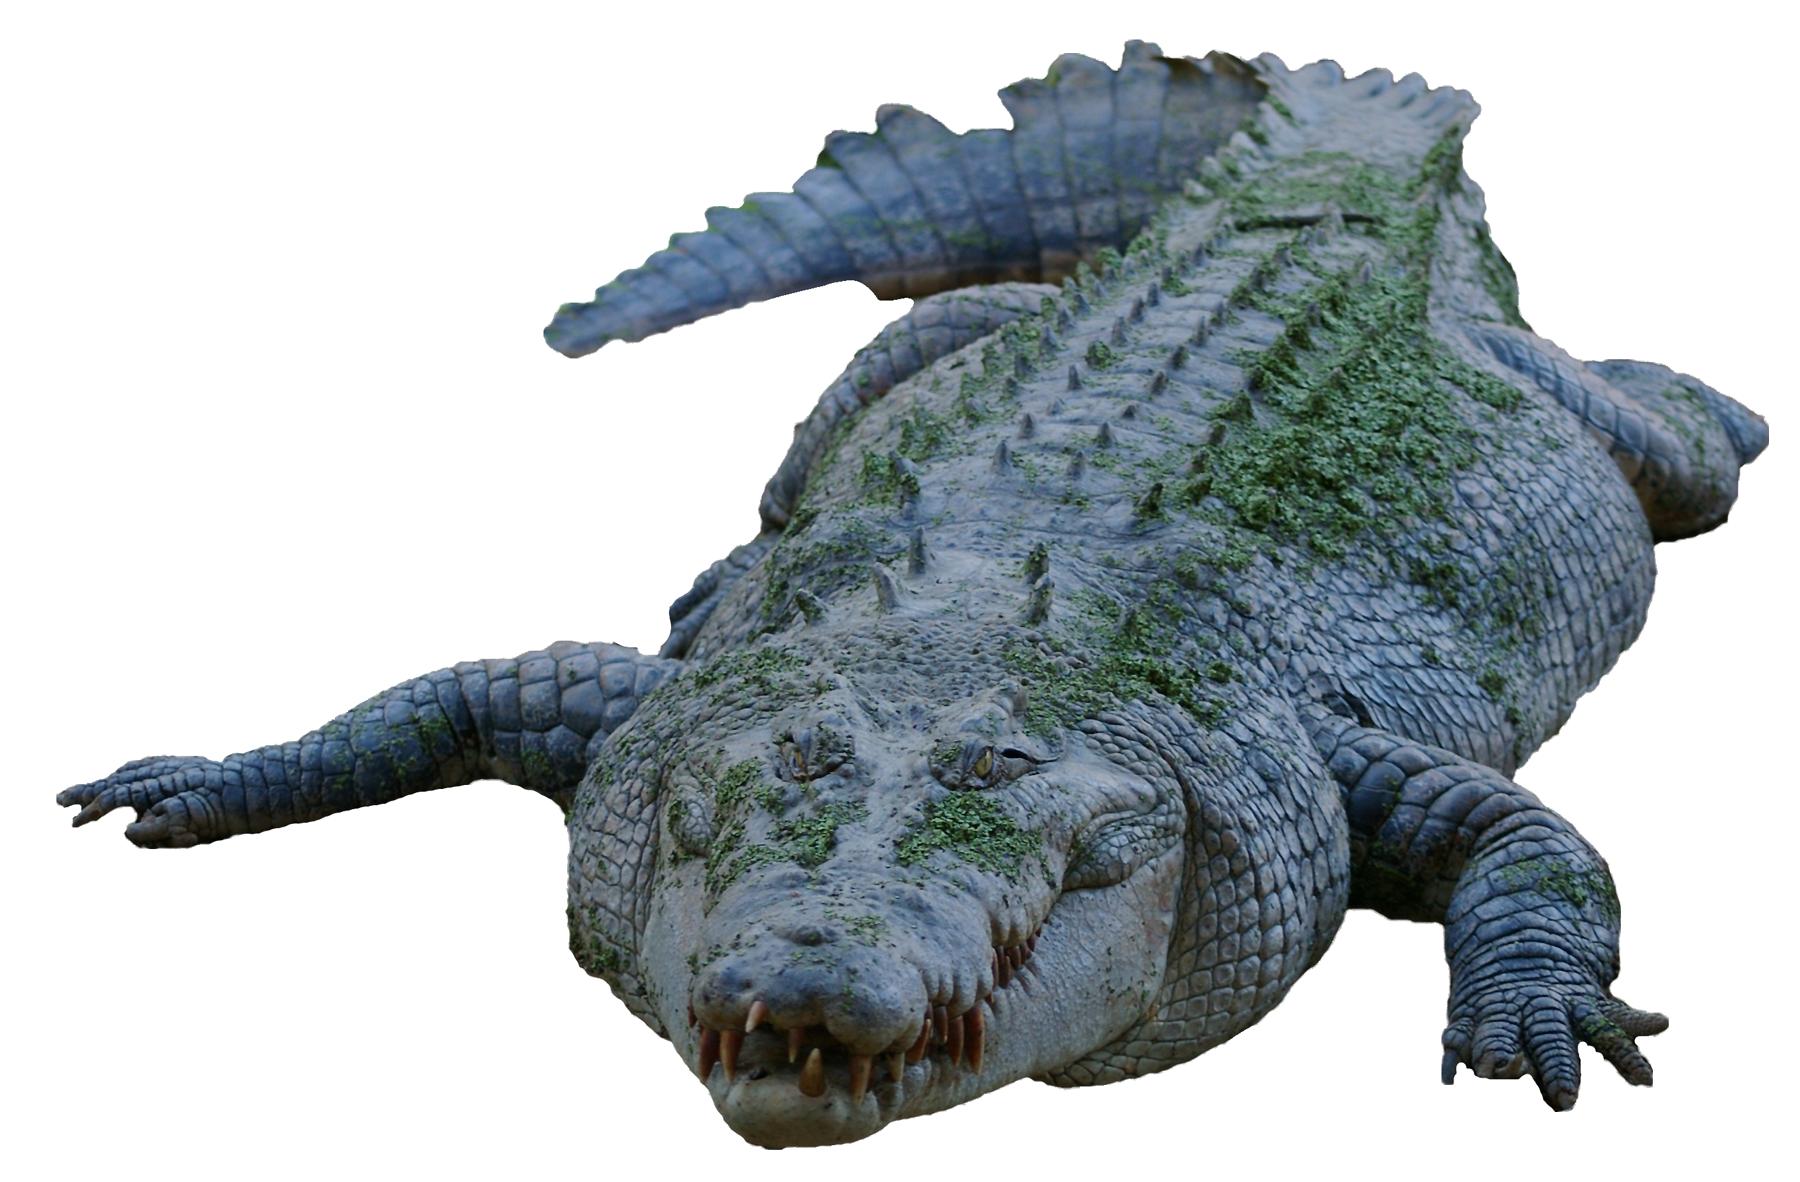 Crocodile PNG Image